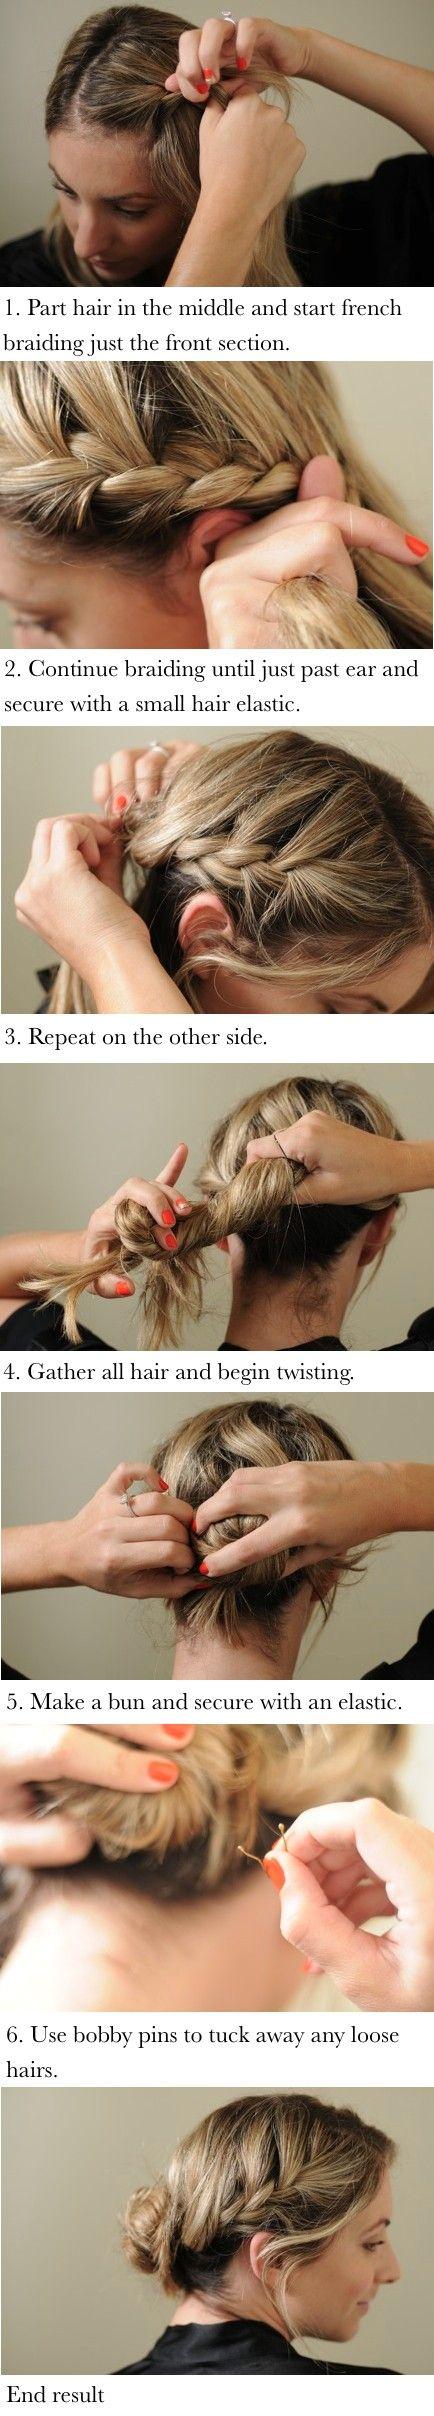 2 braids and a bun